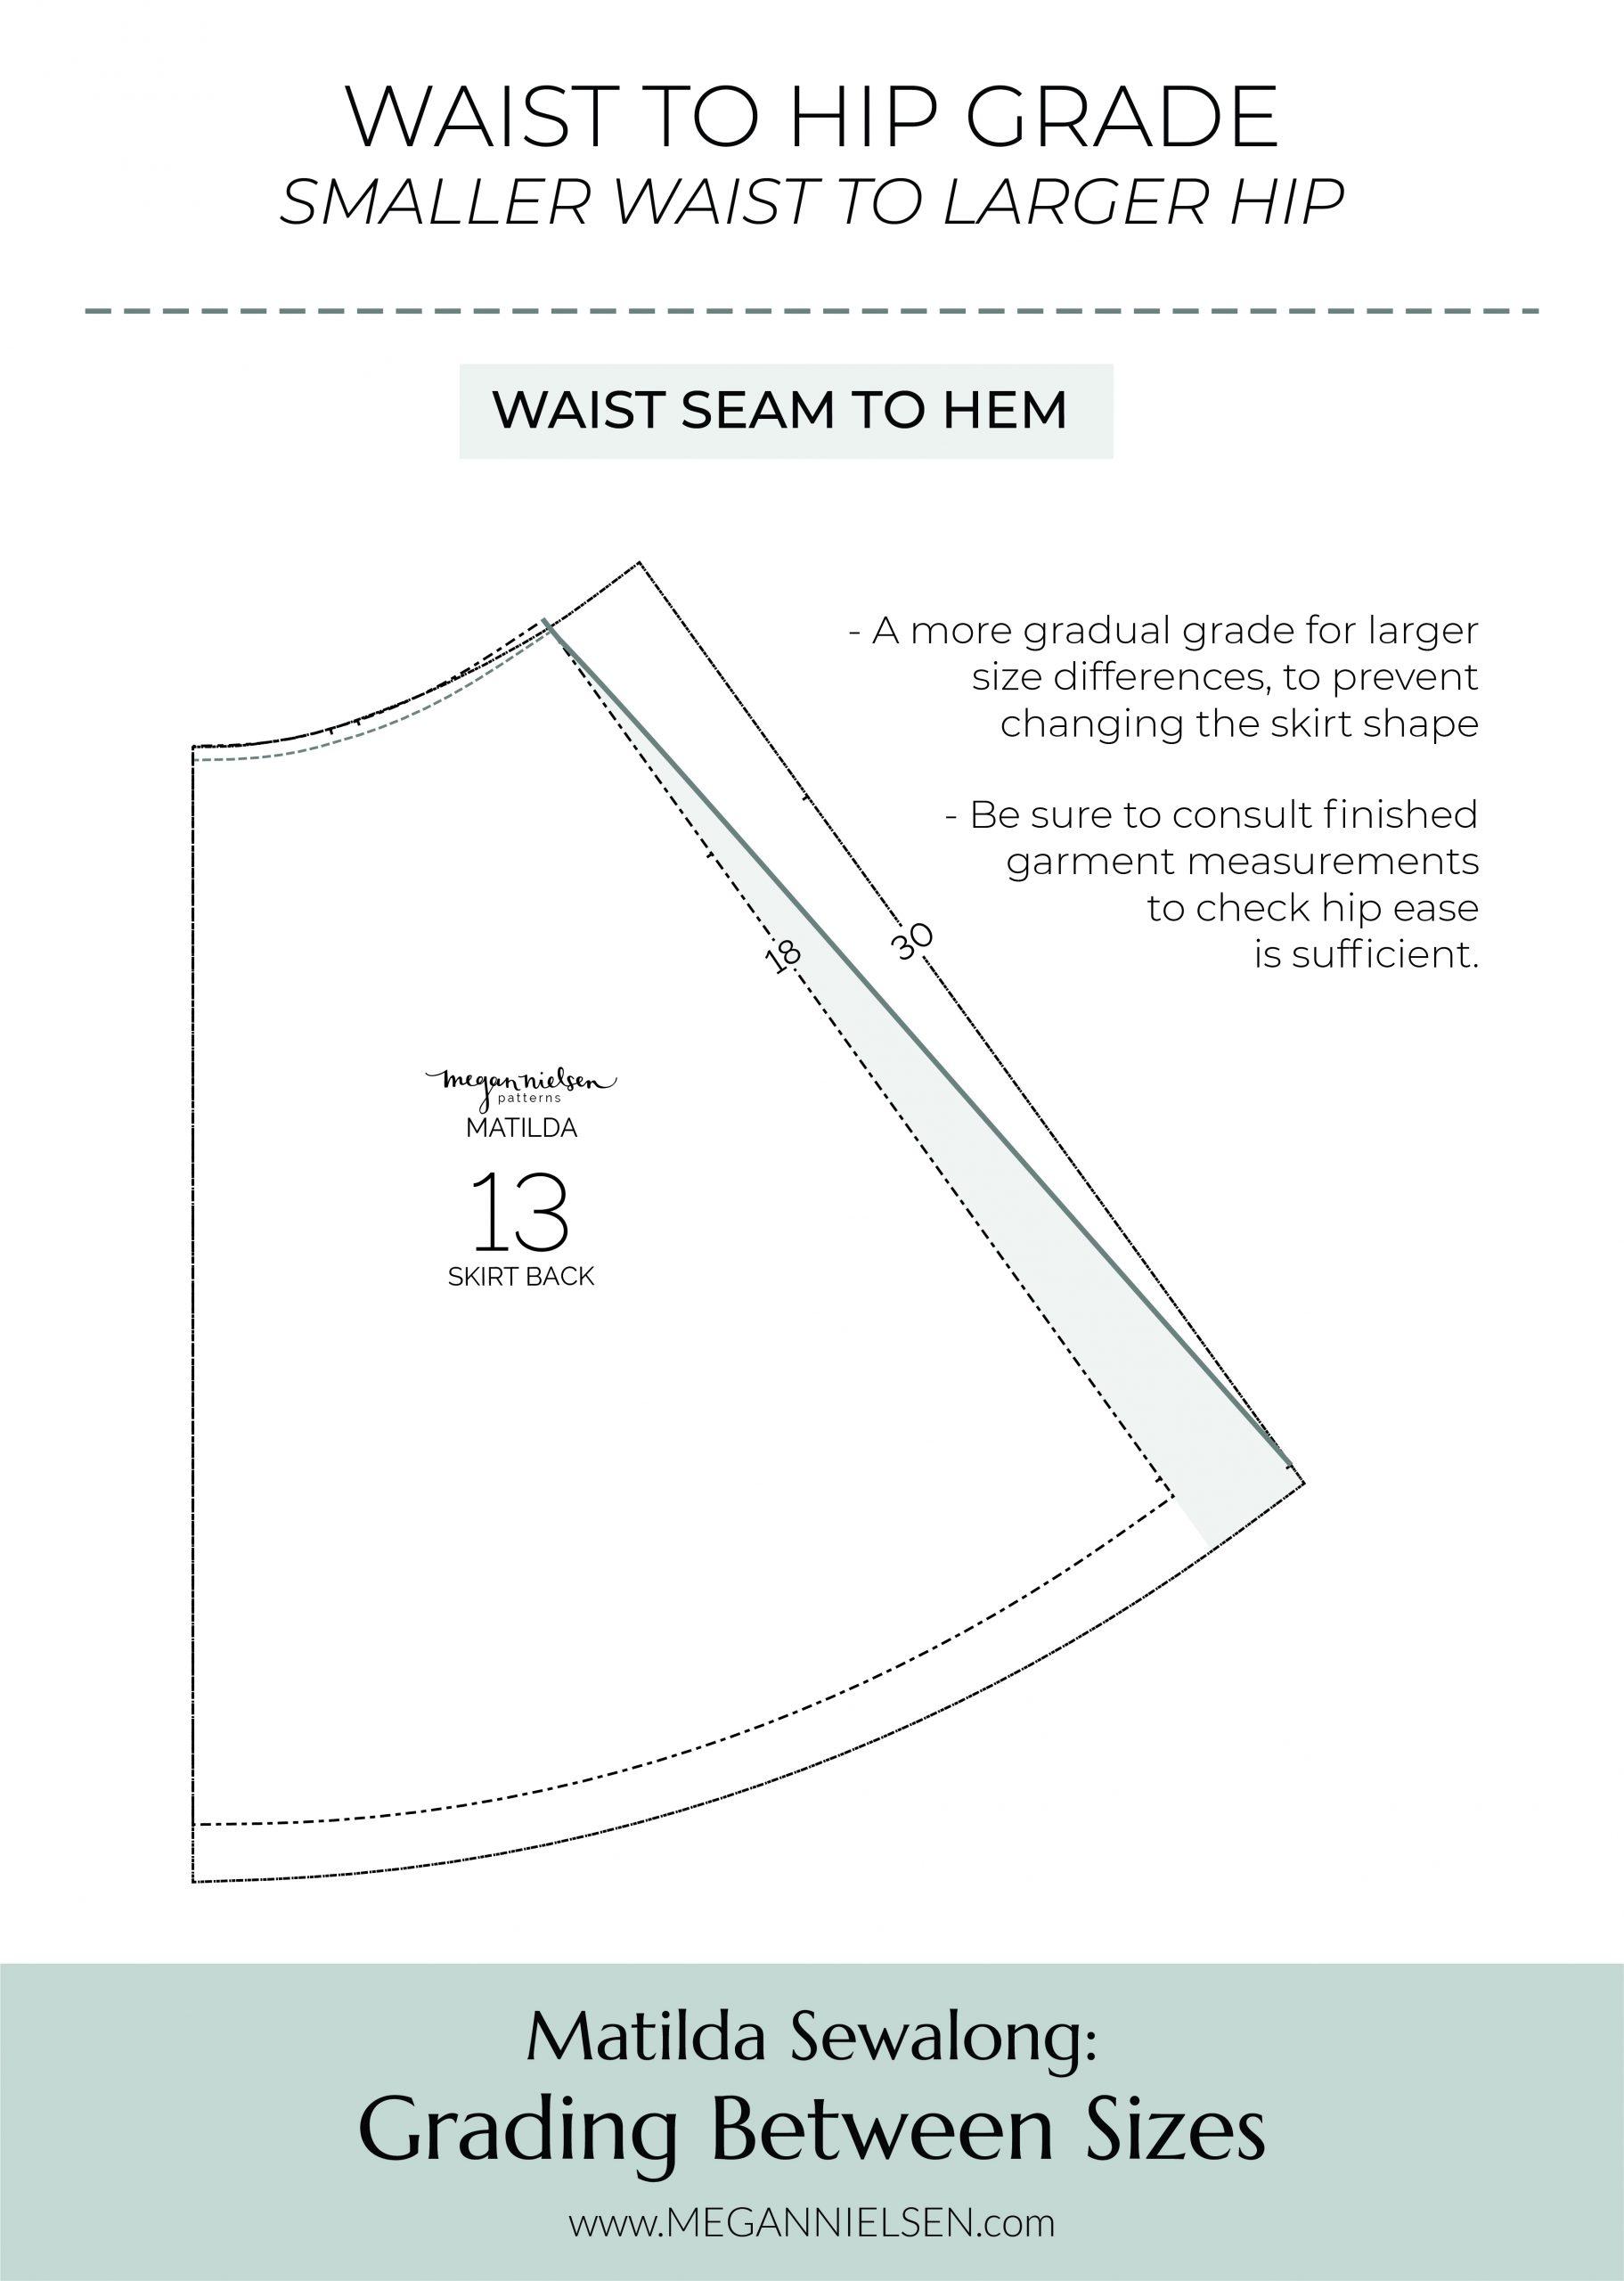 Megan Nielsen Patterns   Matilda Sewalong: Grading Between Sizes - Waist To Hip Grade - Waist Seam To Hem Method